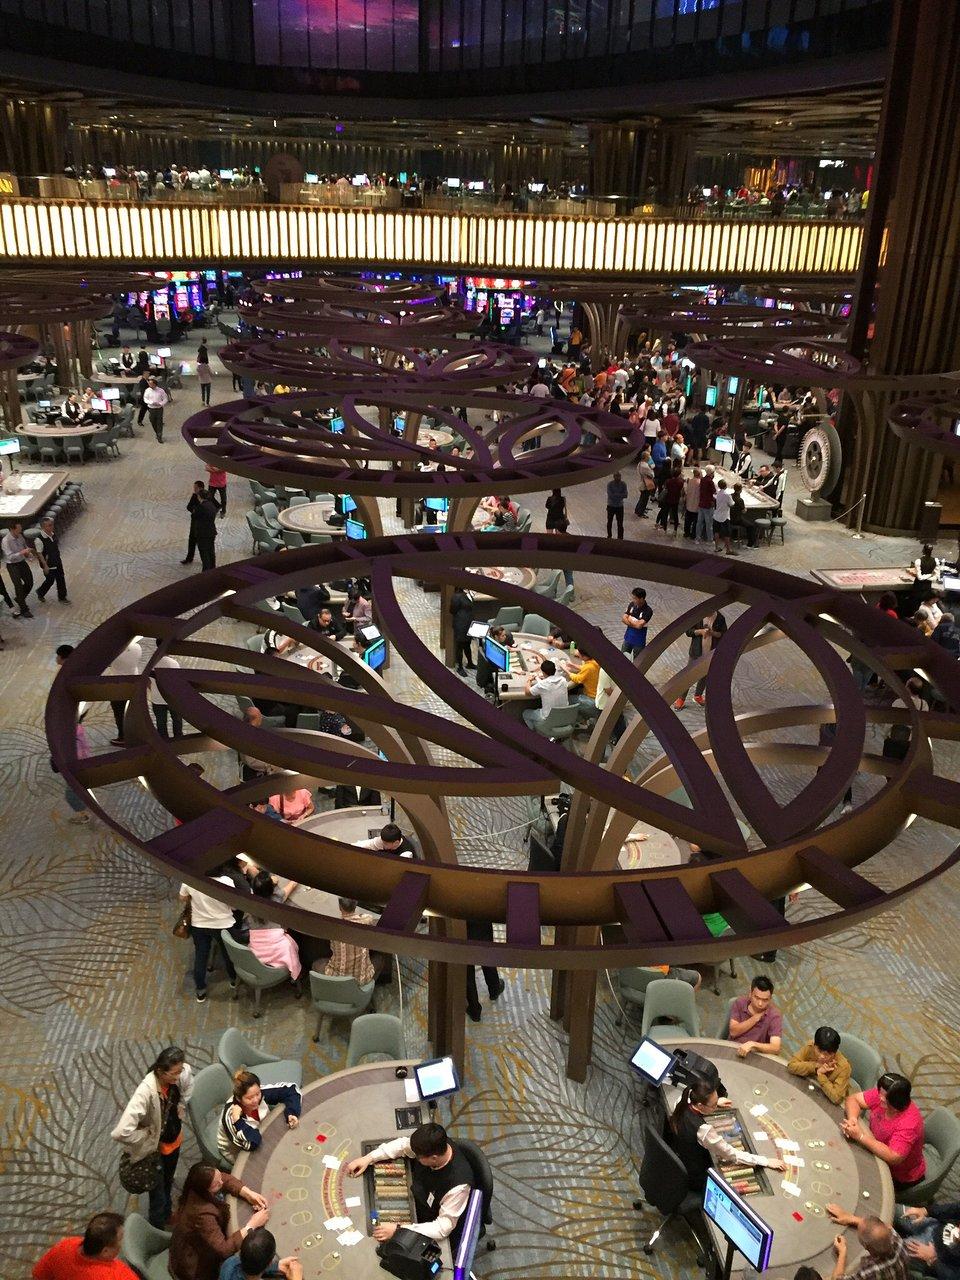 Skye casino ceasers palace hotel casino